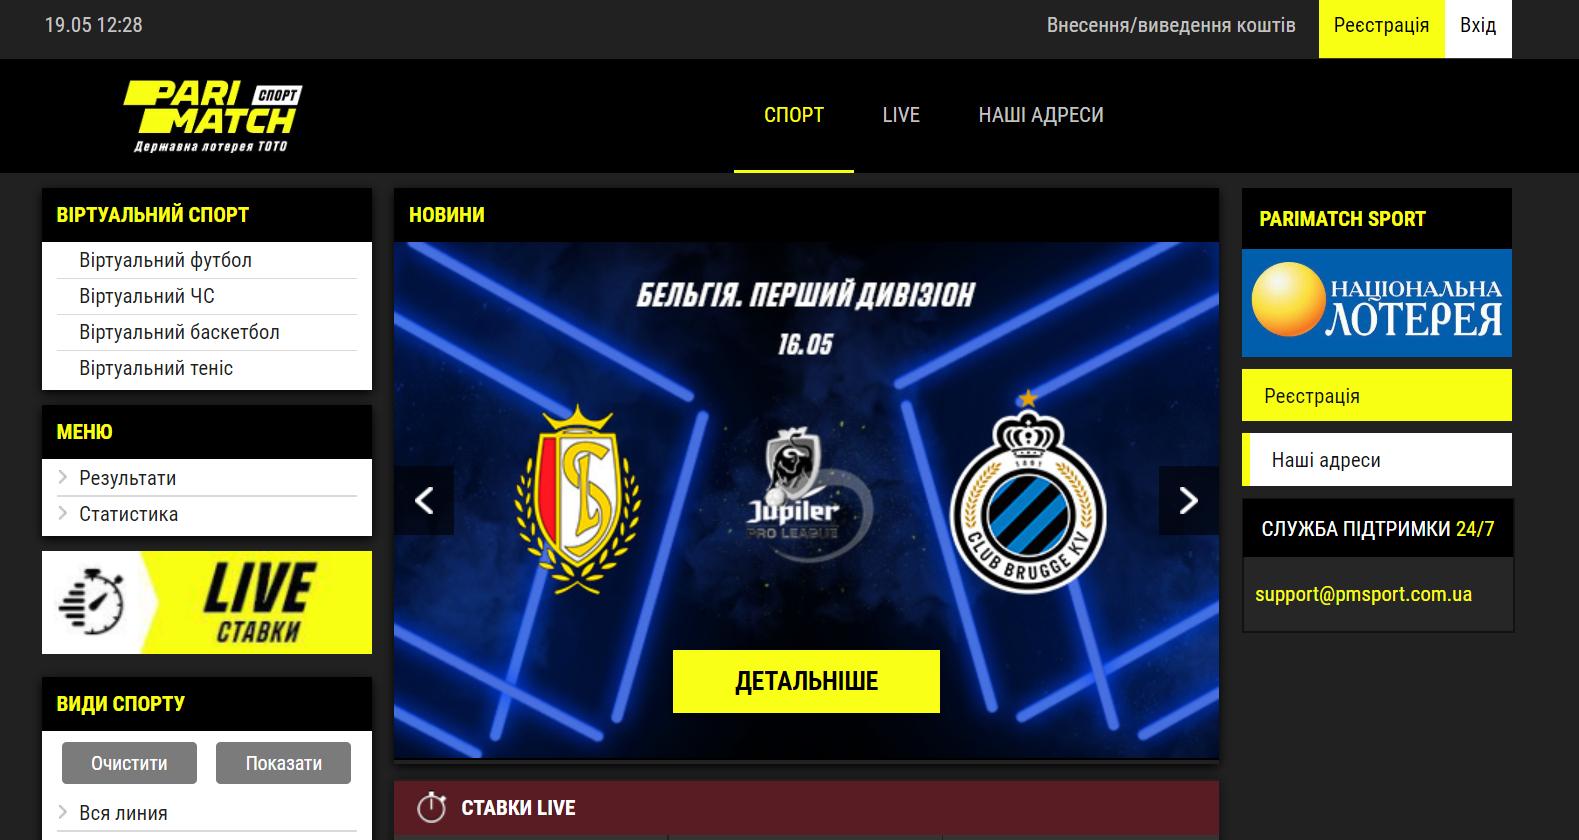 Сотни матчей для фанатов спорта на сайте Париматч